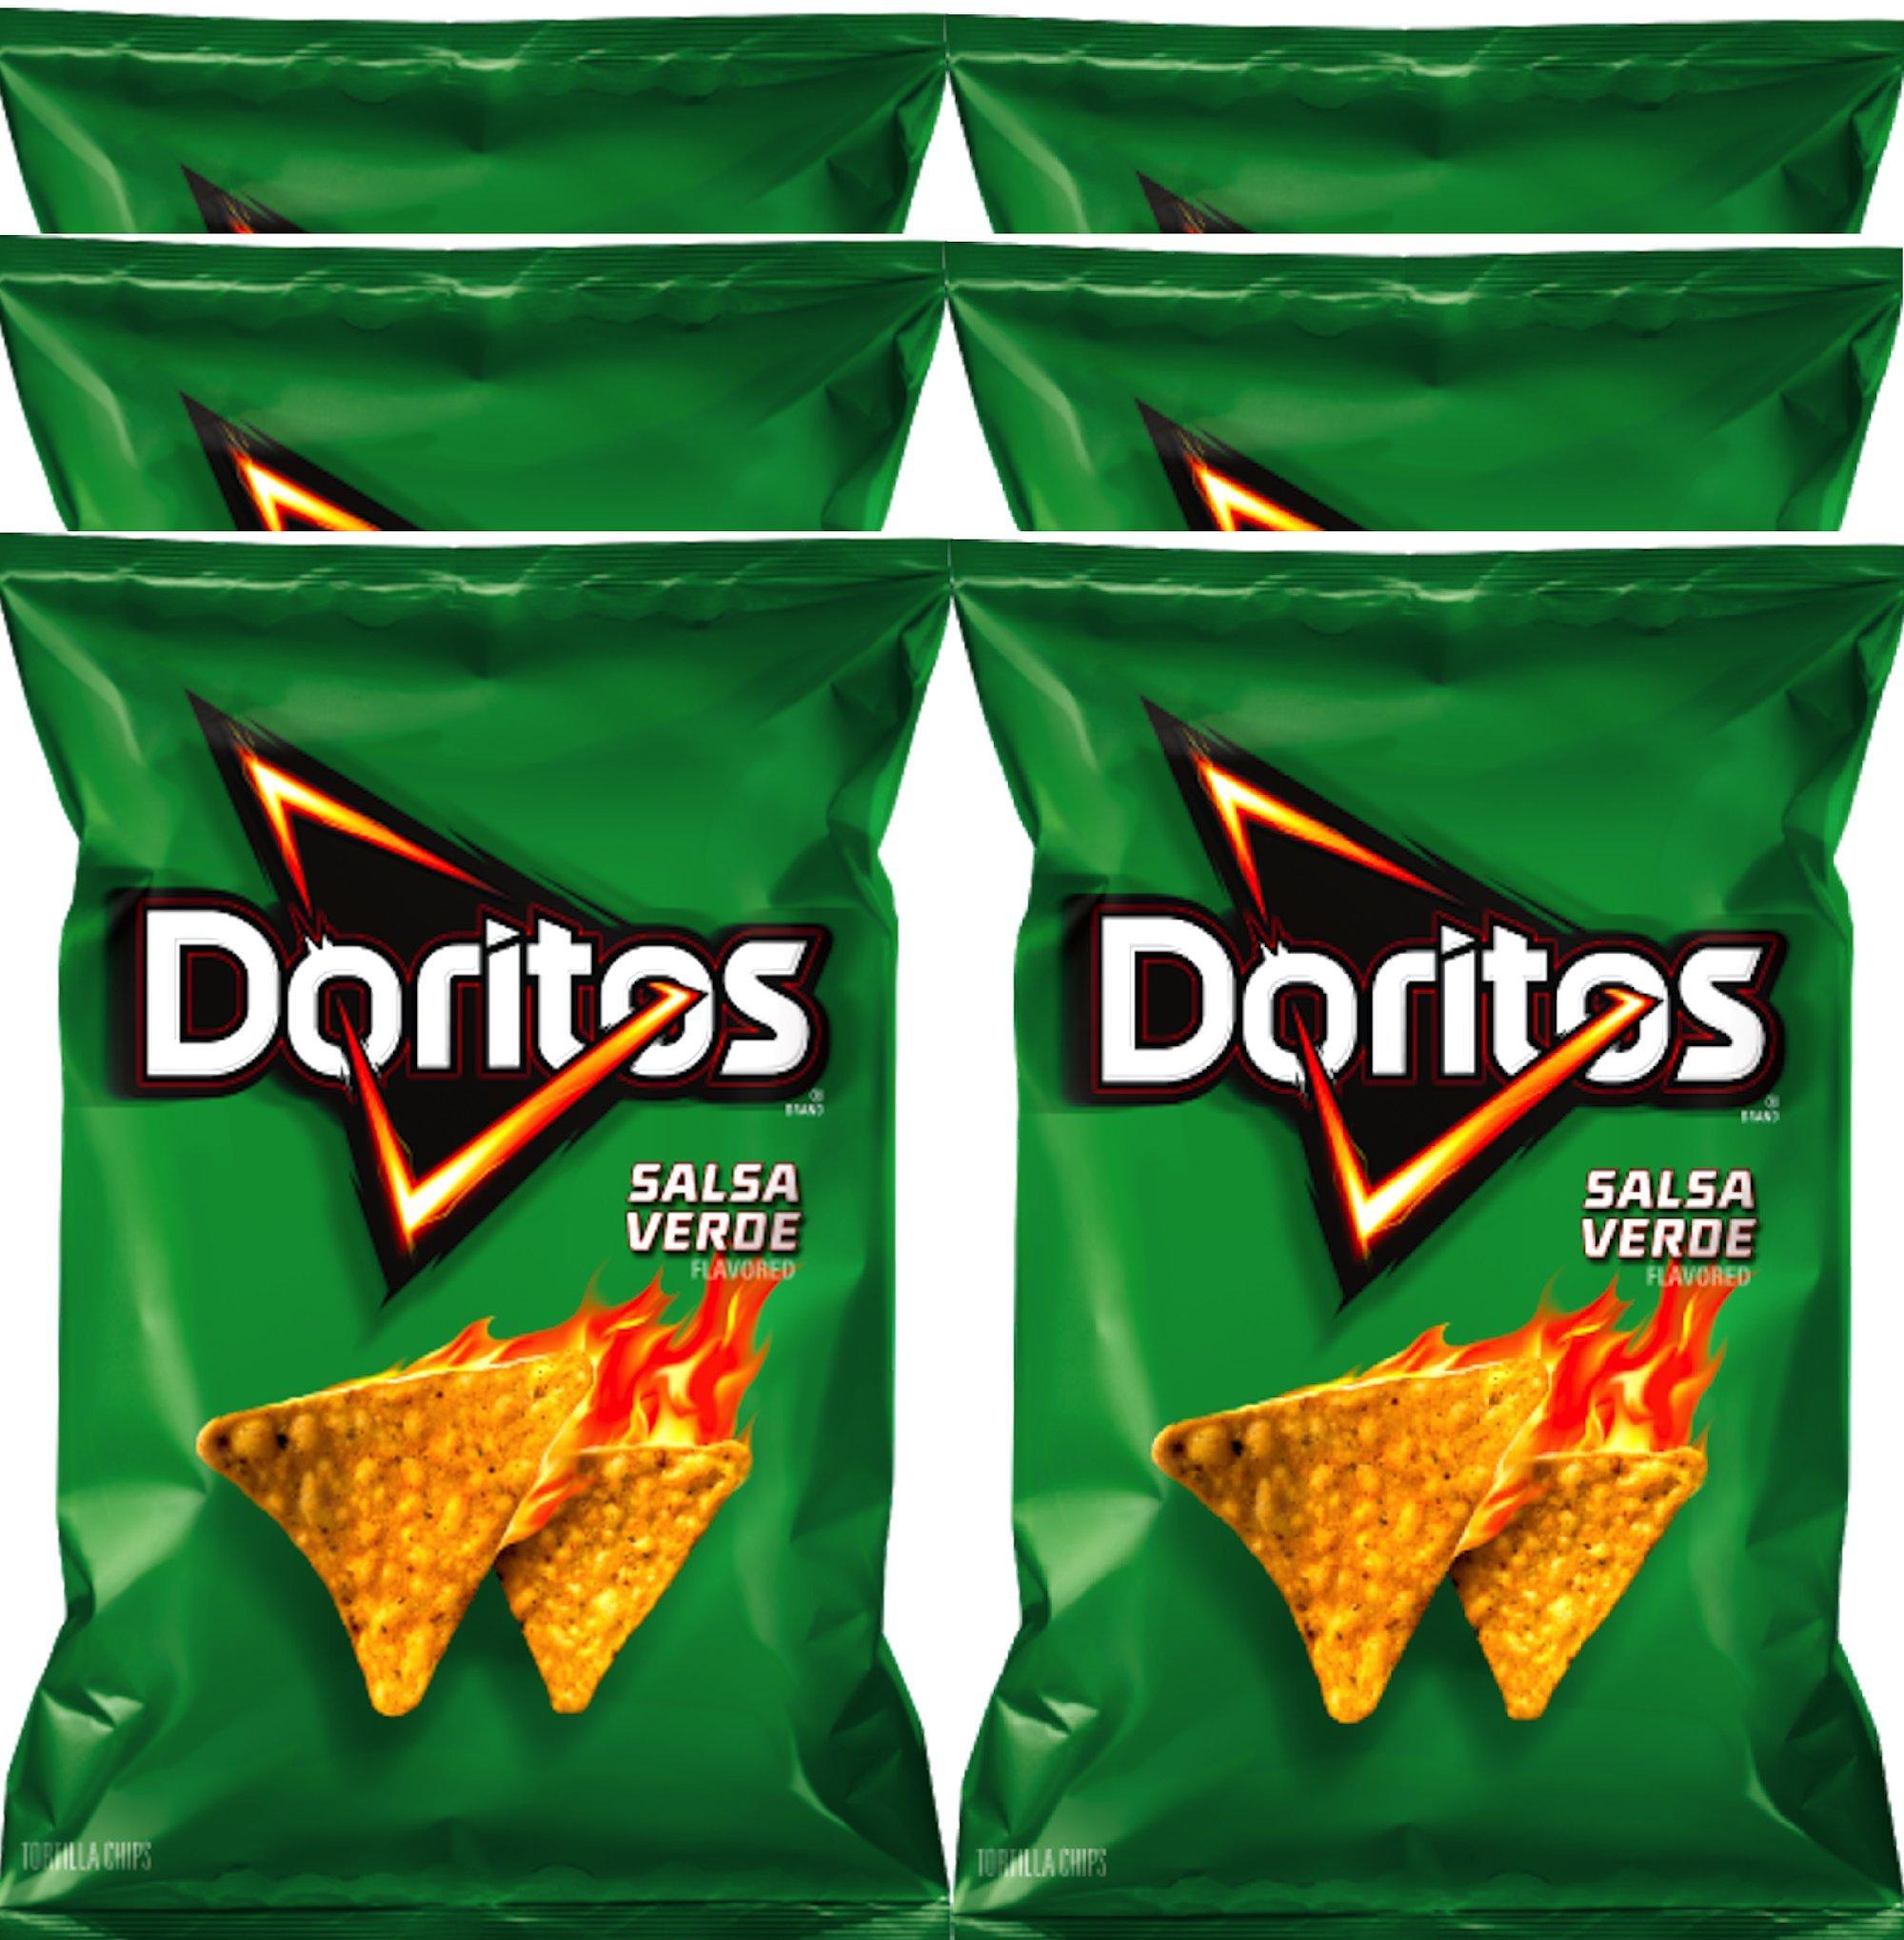 Doritos Salsa verde Flavored Tortilla Chips 9.75 oz Bags (6) by Doritos